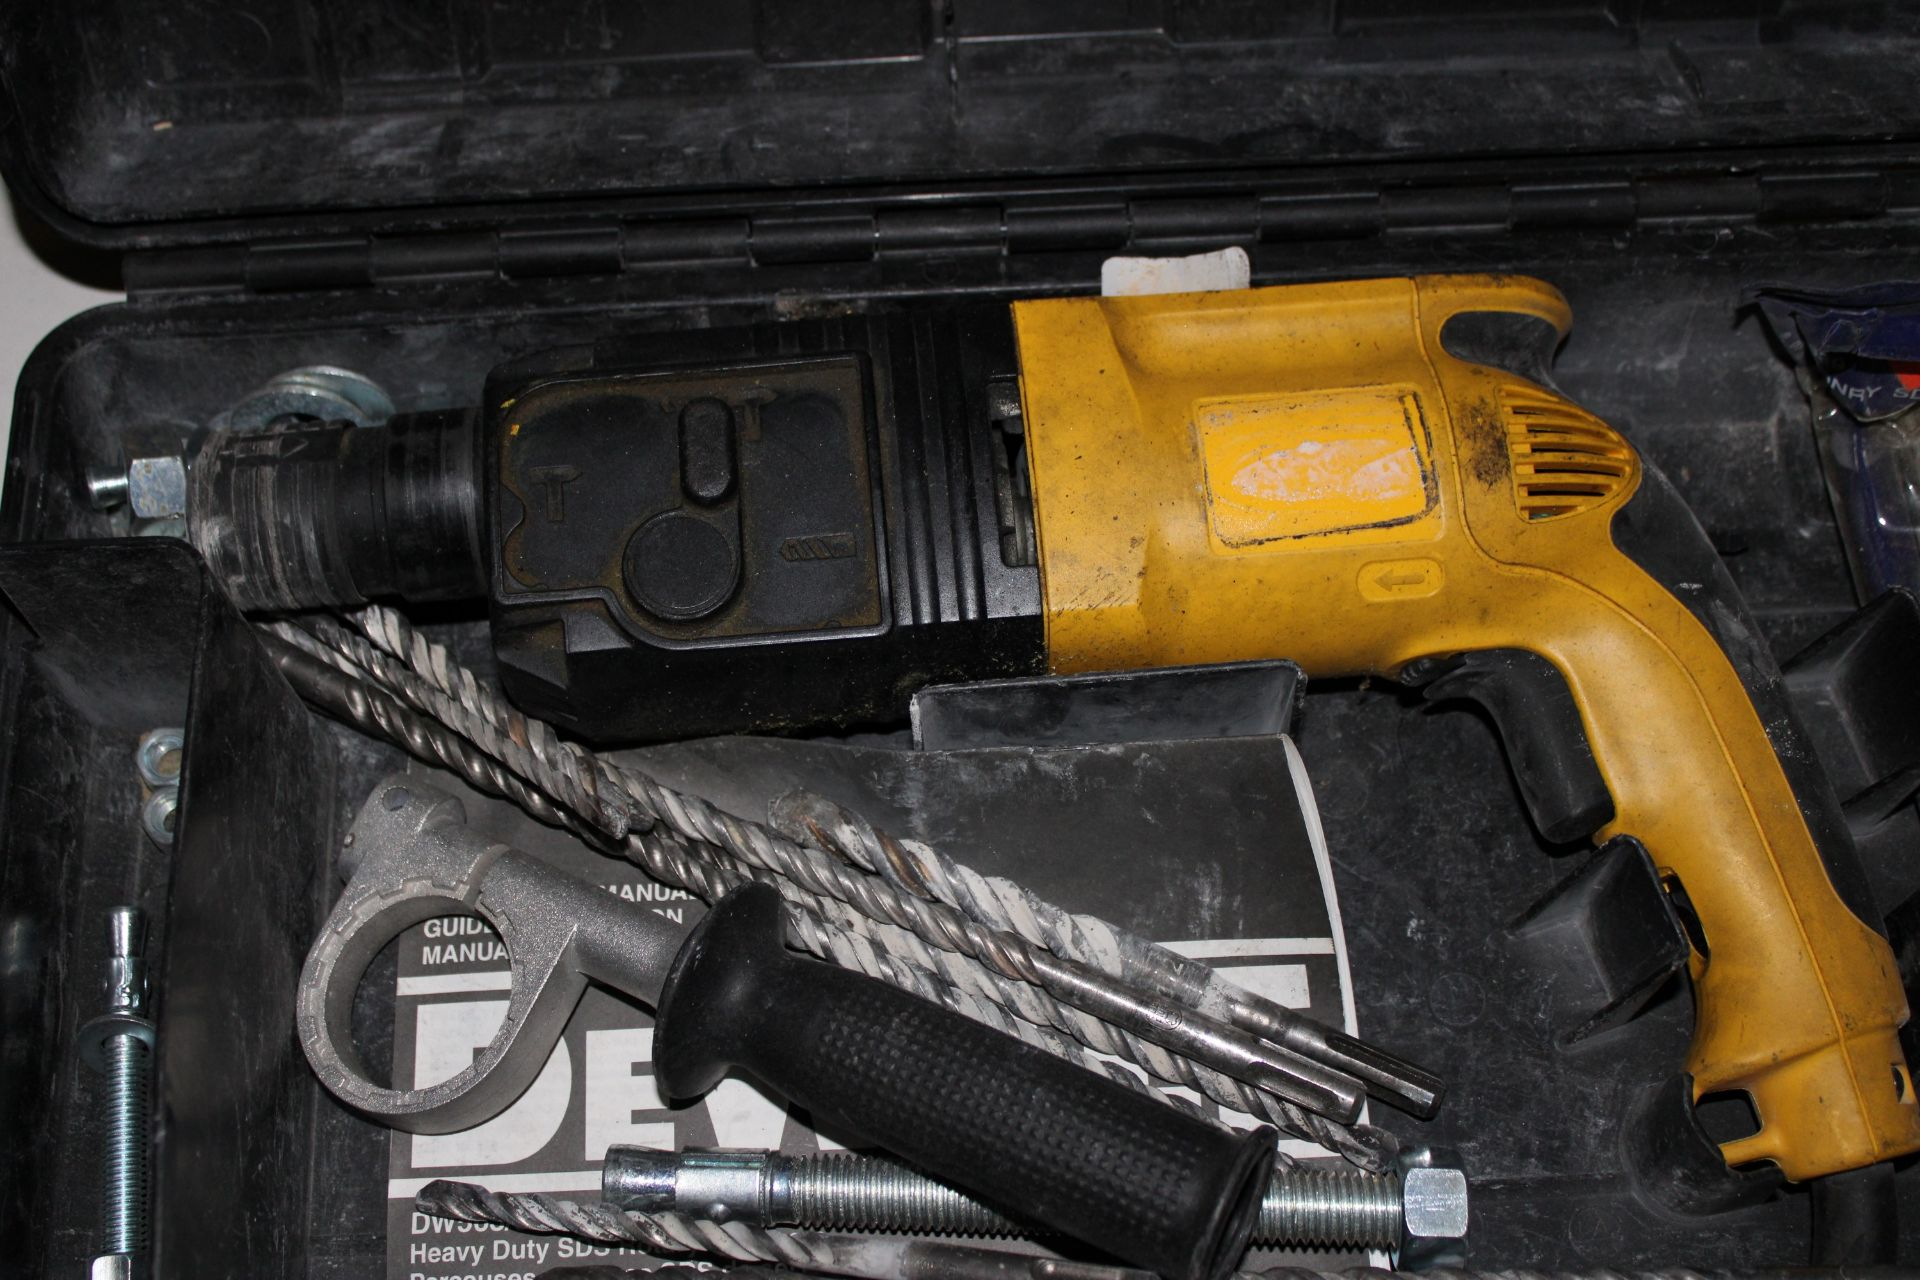 Lot 5 - DEWALT Rotary Hammer Drill